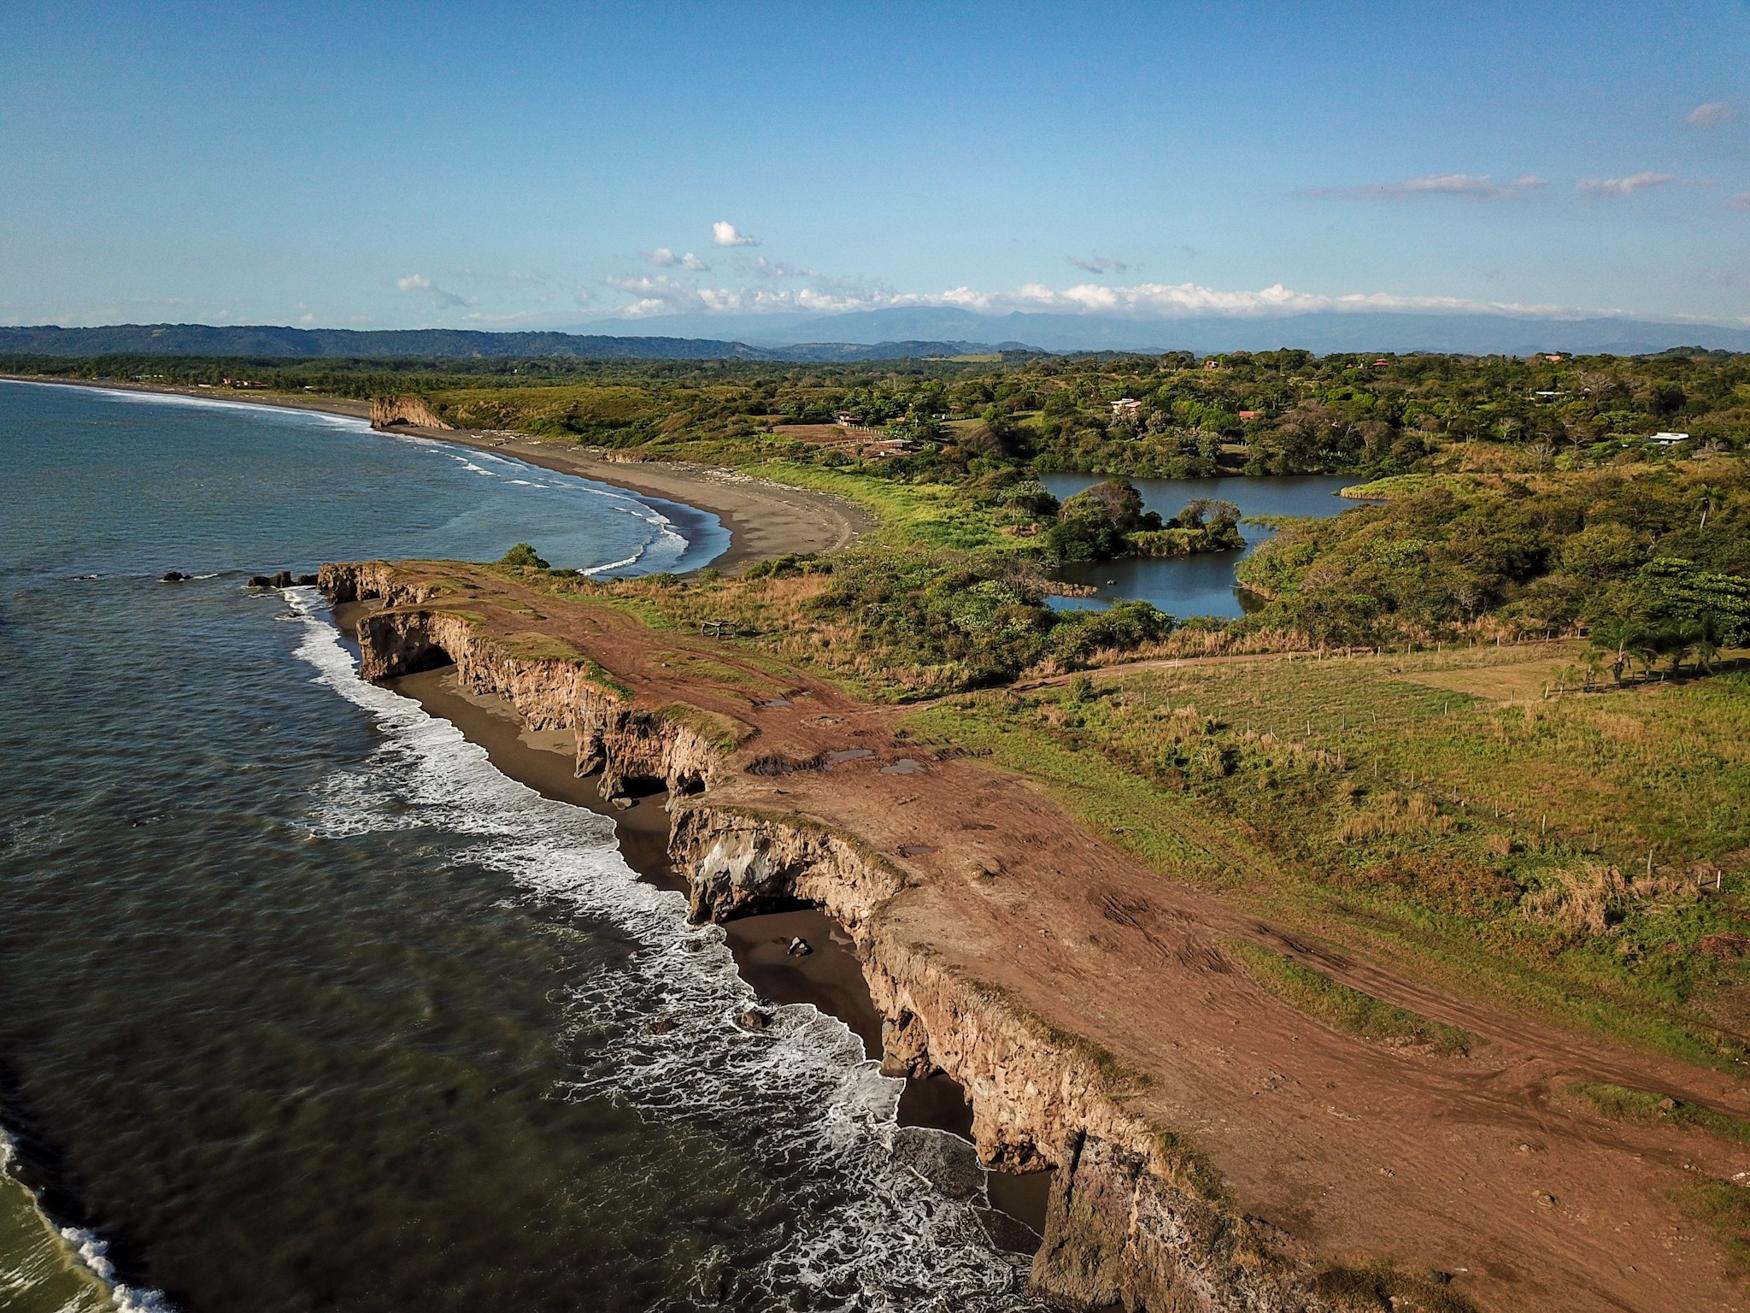 Yoga-Retreat-Drone-Photography-Costa-Rica-36.jpg